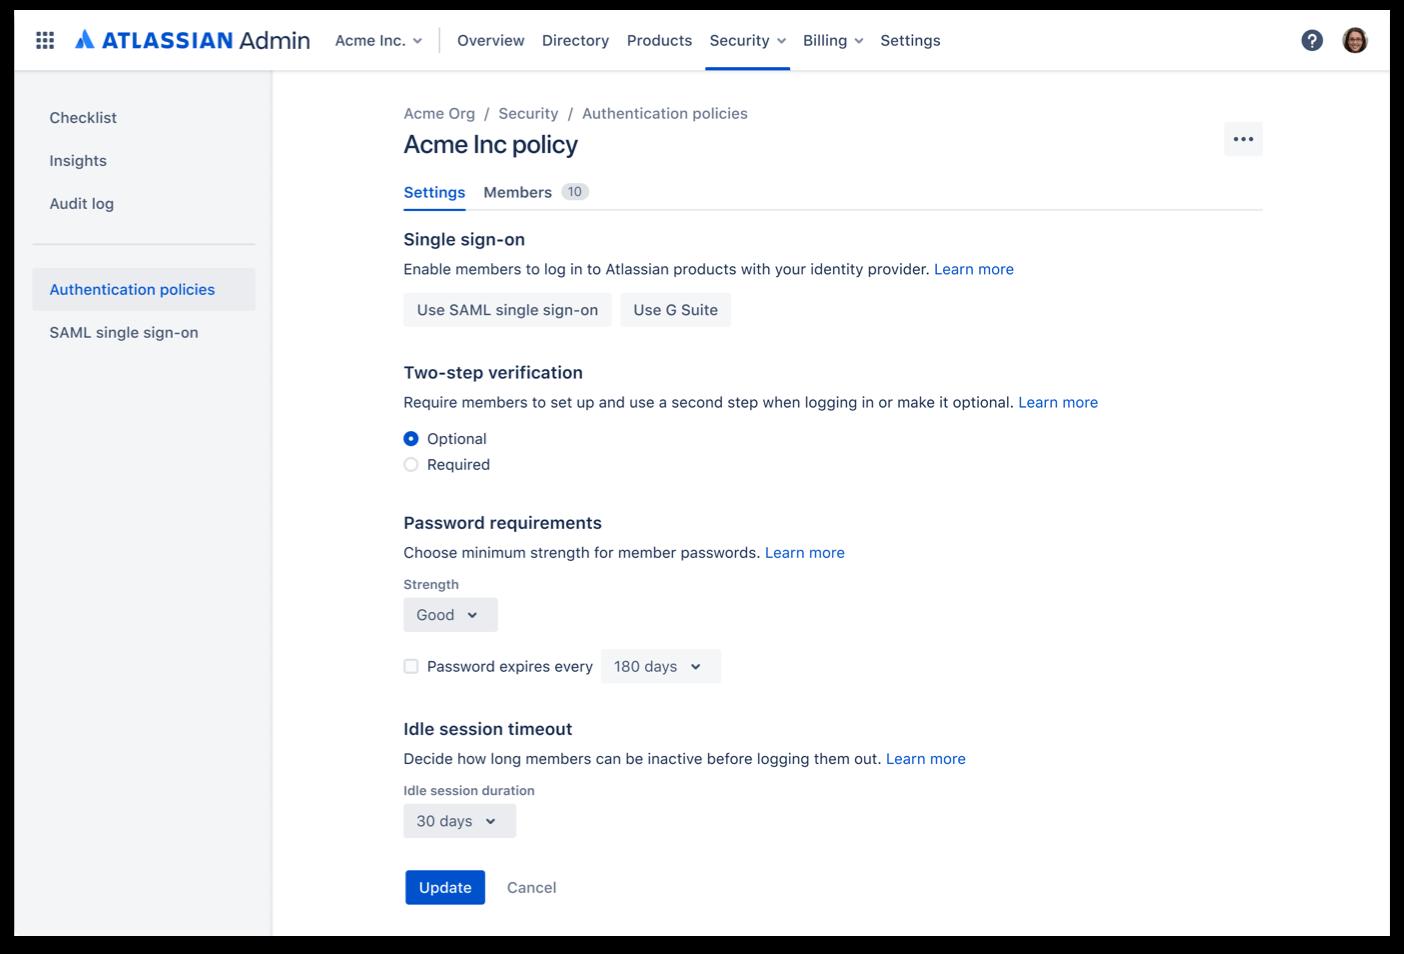 Authentication policies screenshot